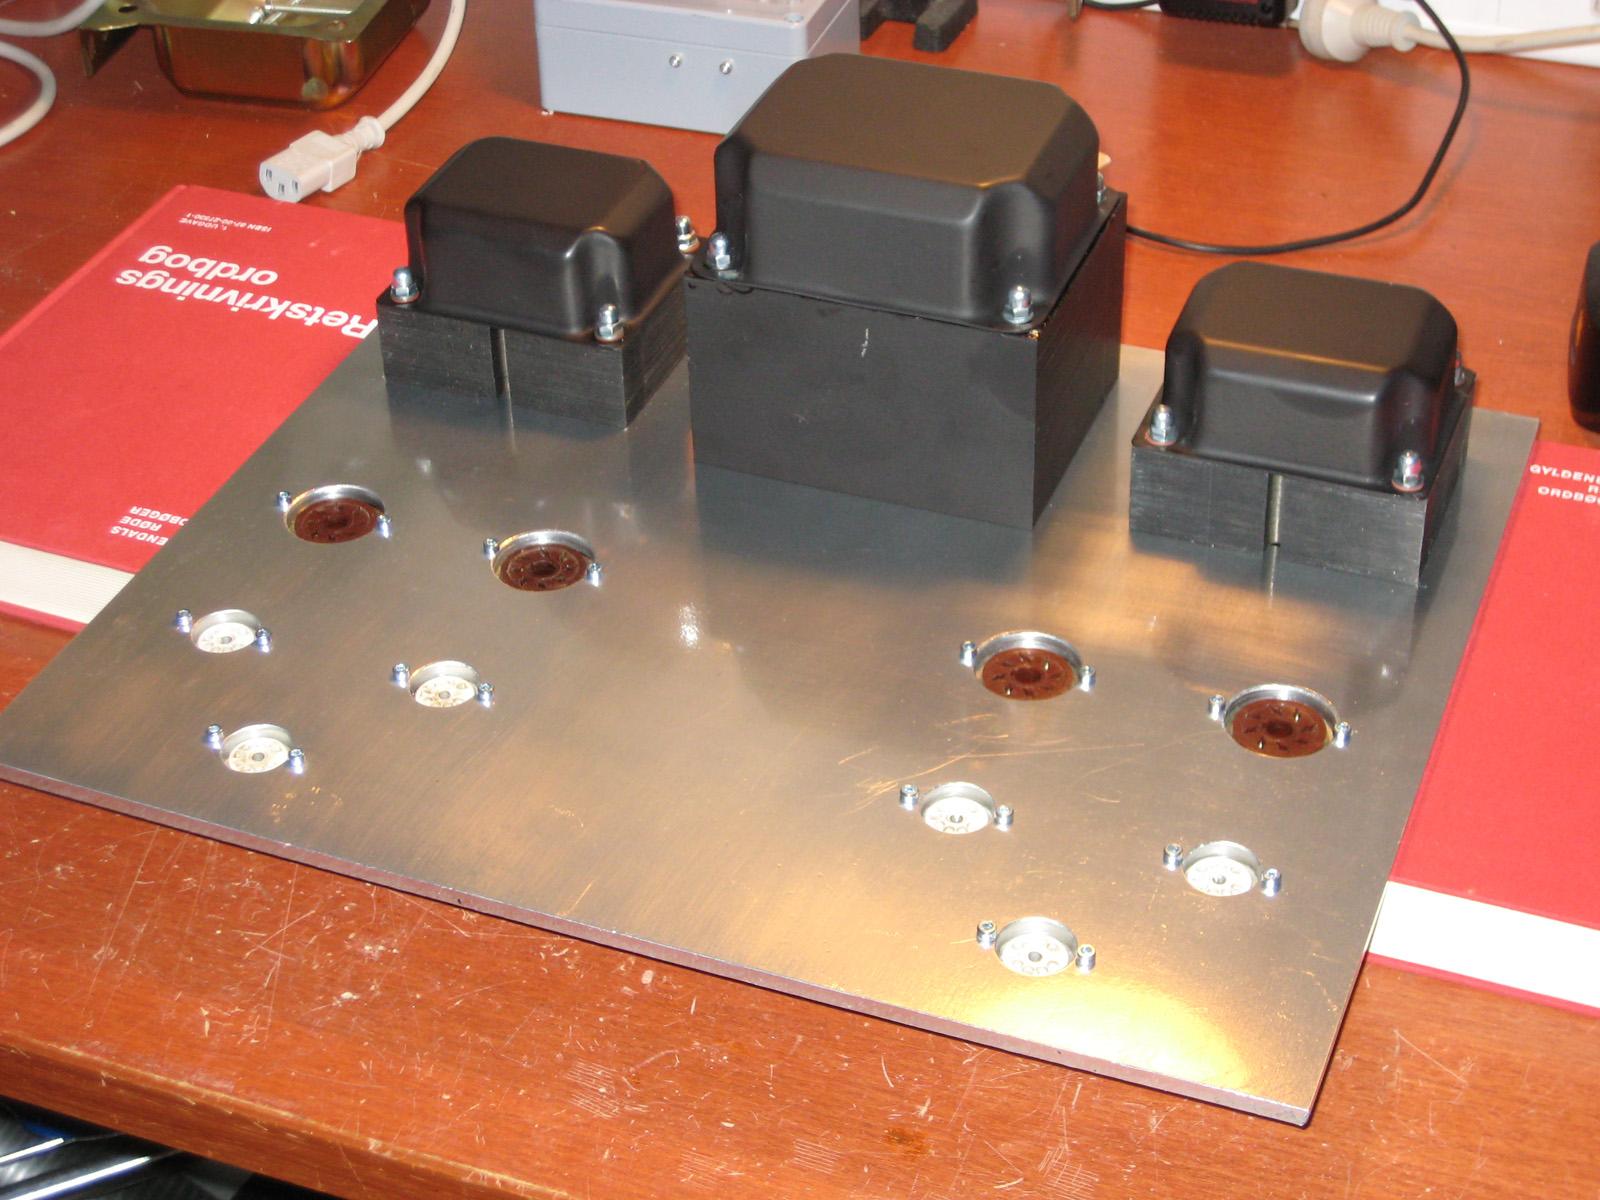 2x30w El34 Tube Amplifier Kaizer Power Electronics Stereo Circuit Diagram Amplifiercircuit Img 1697